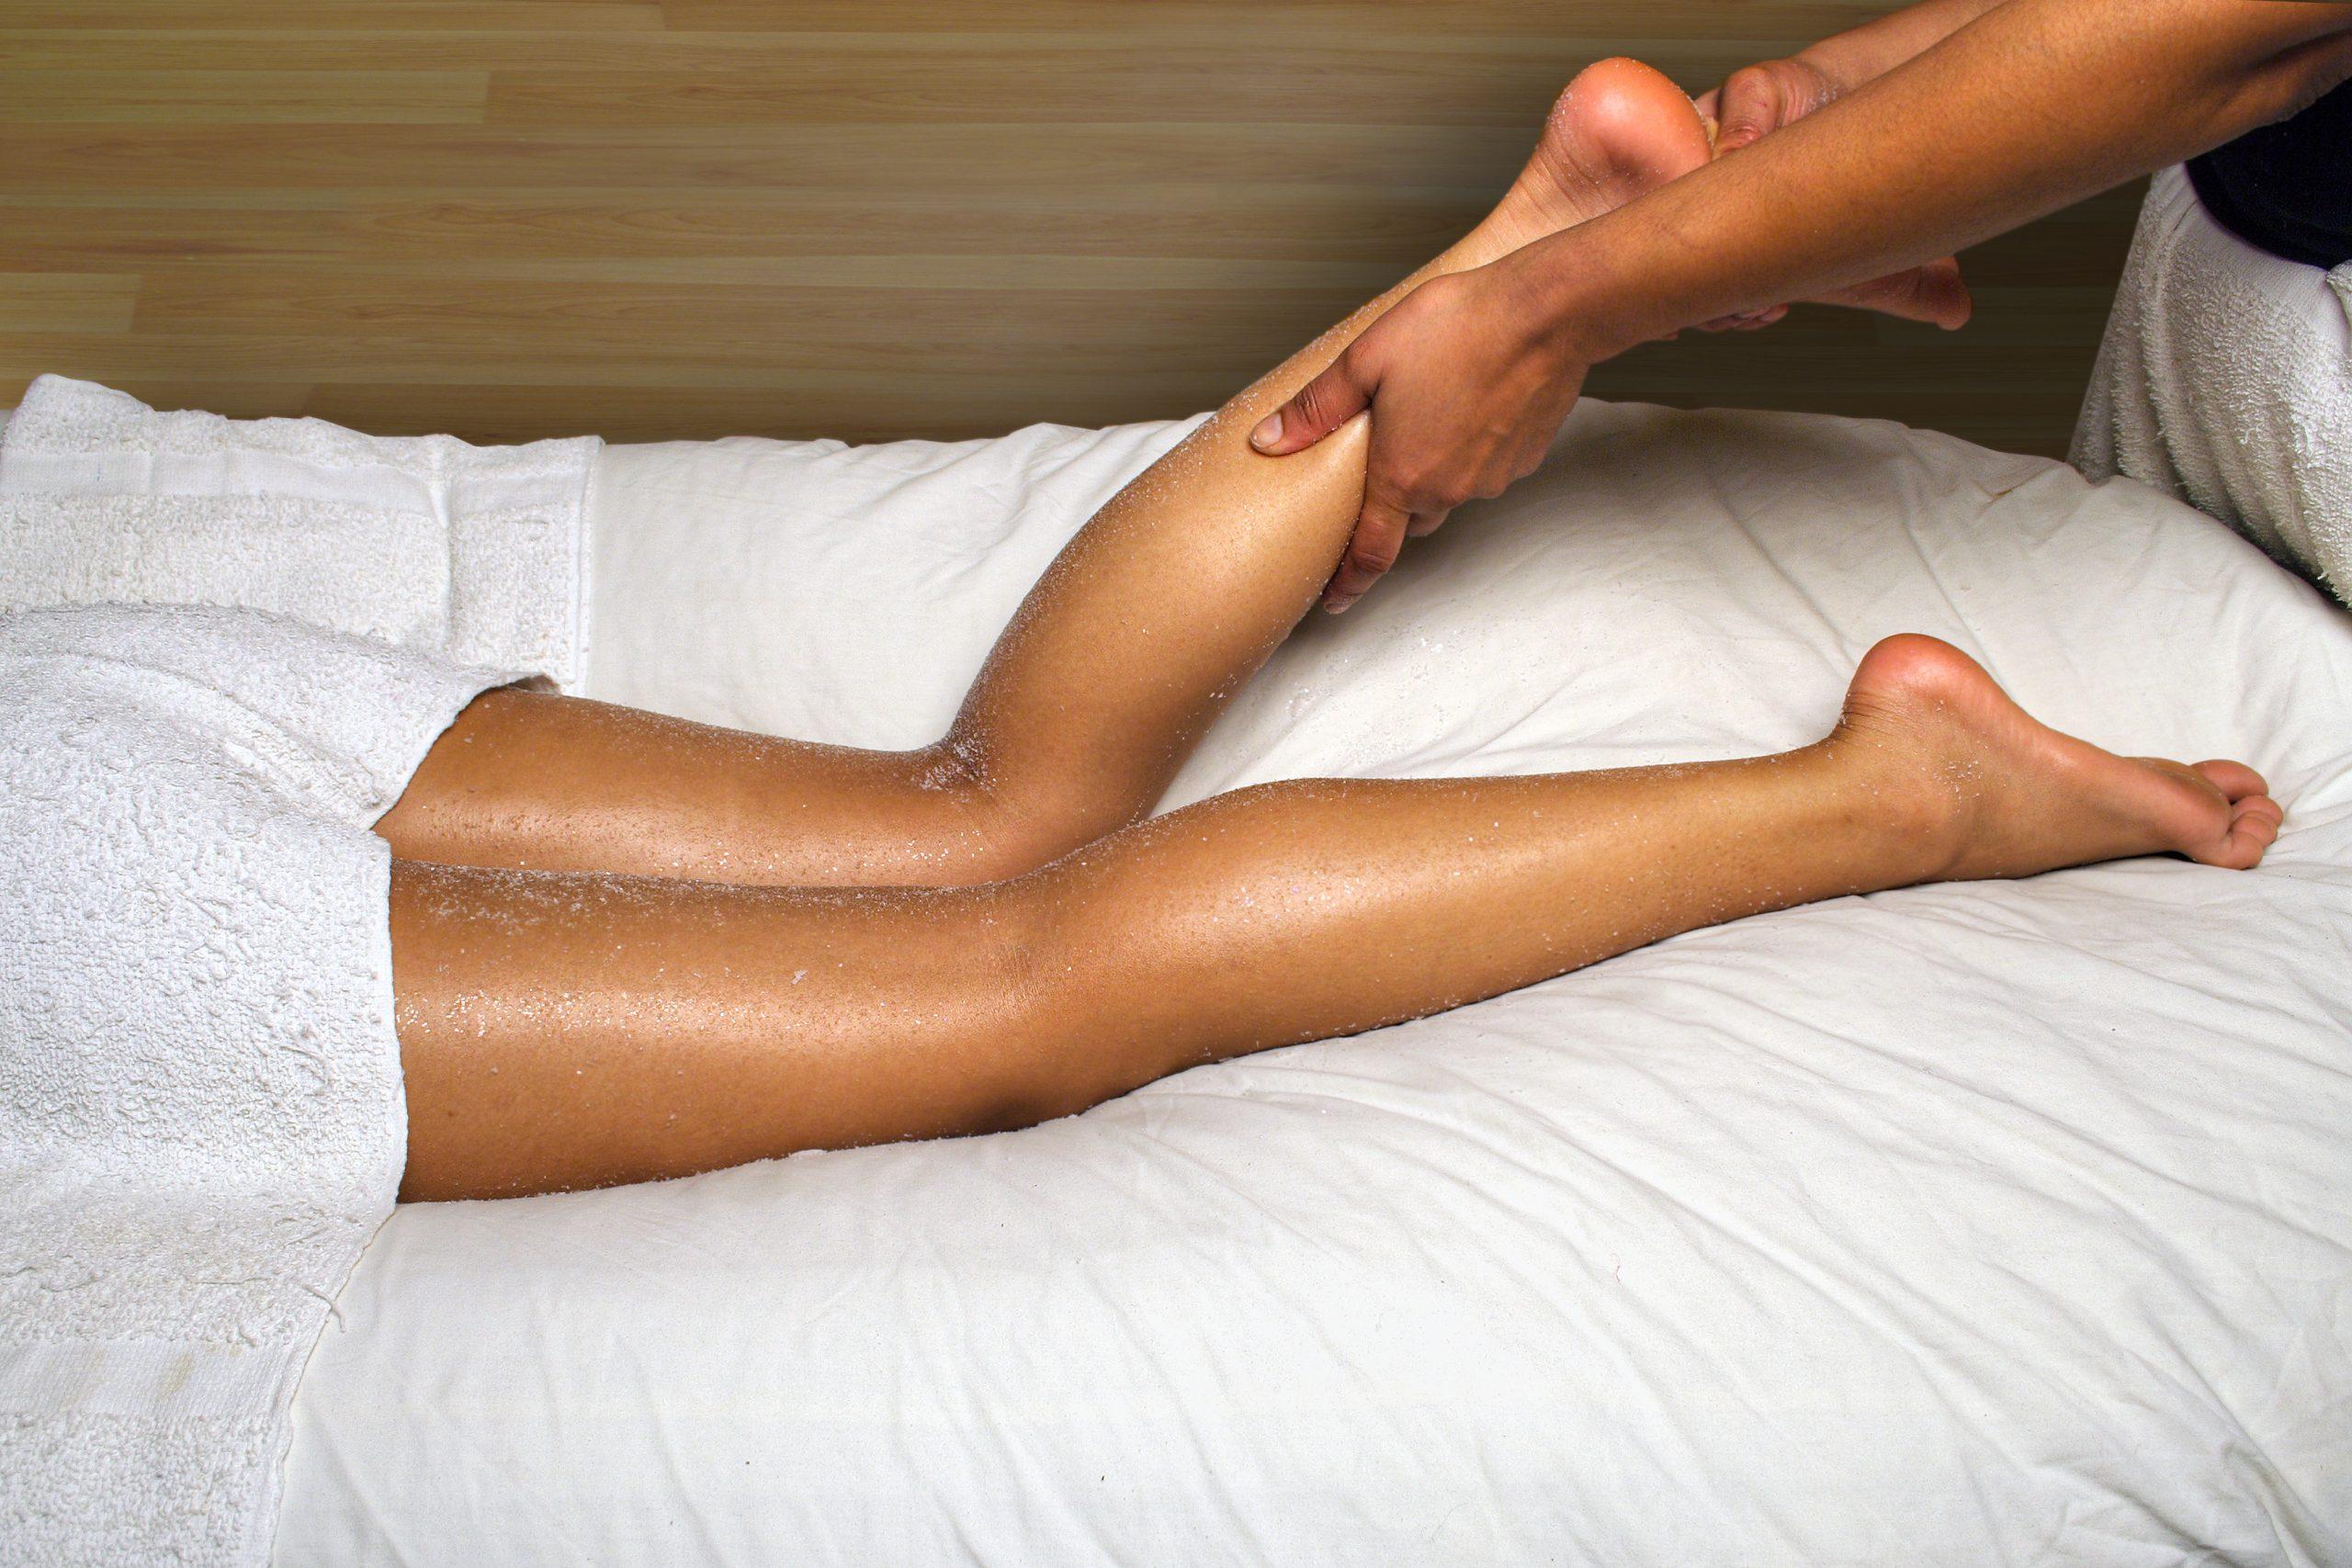 bigstock_Day_Spa_Calf_And_Foot_Massage_1158781